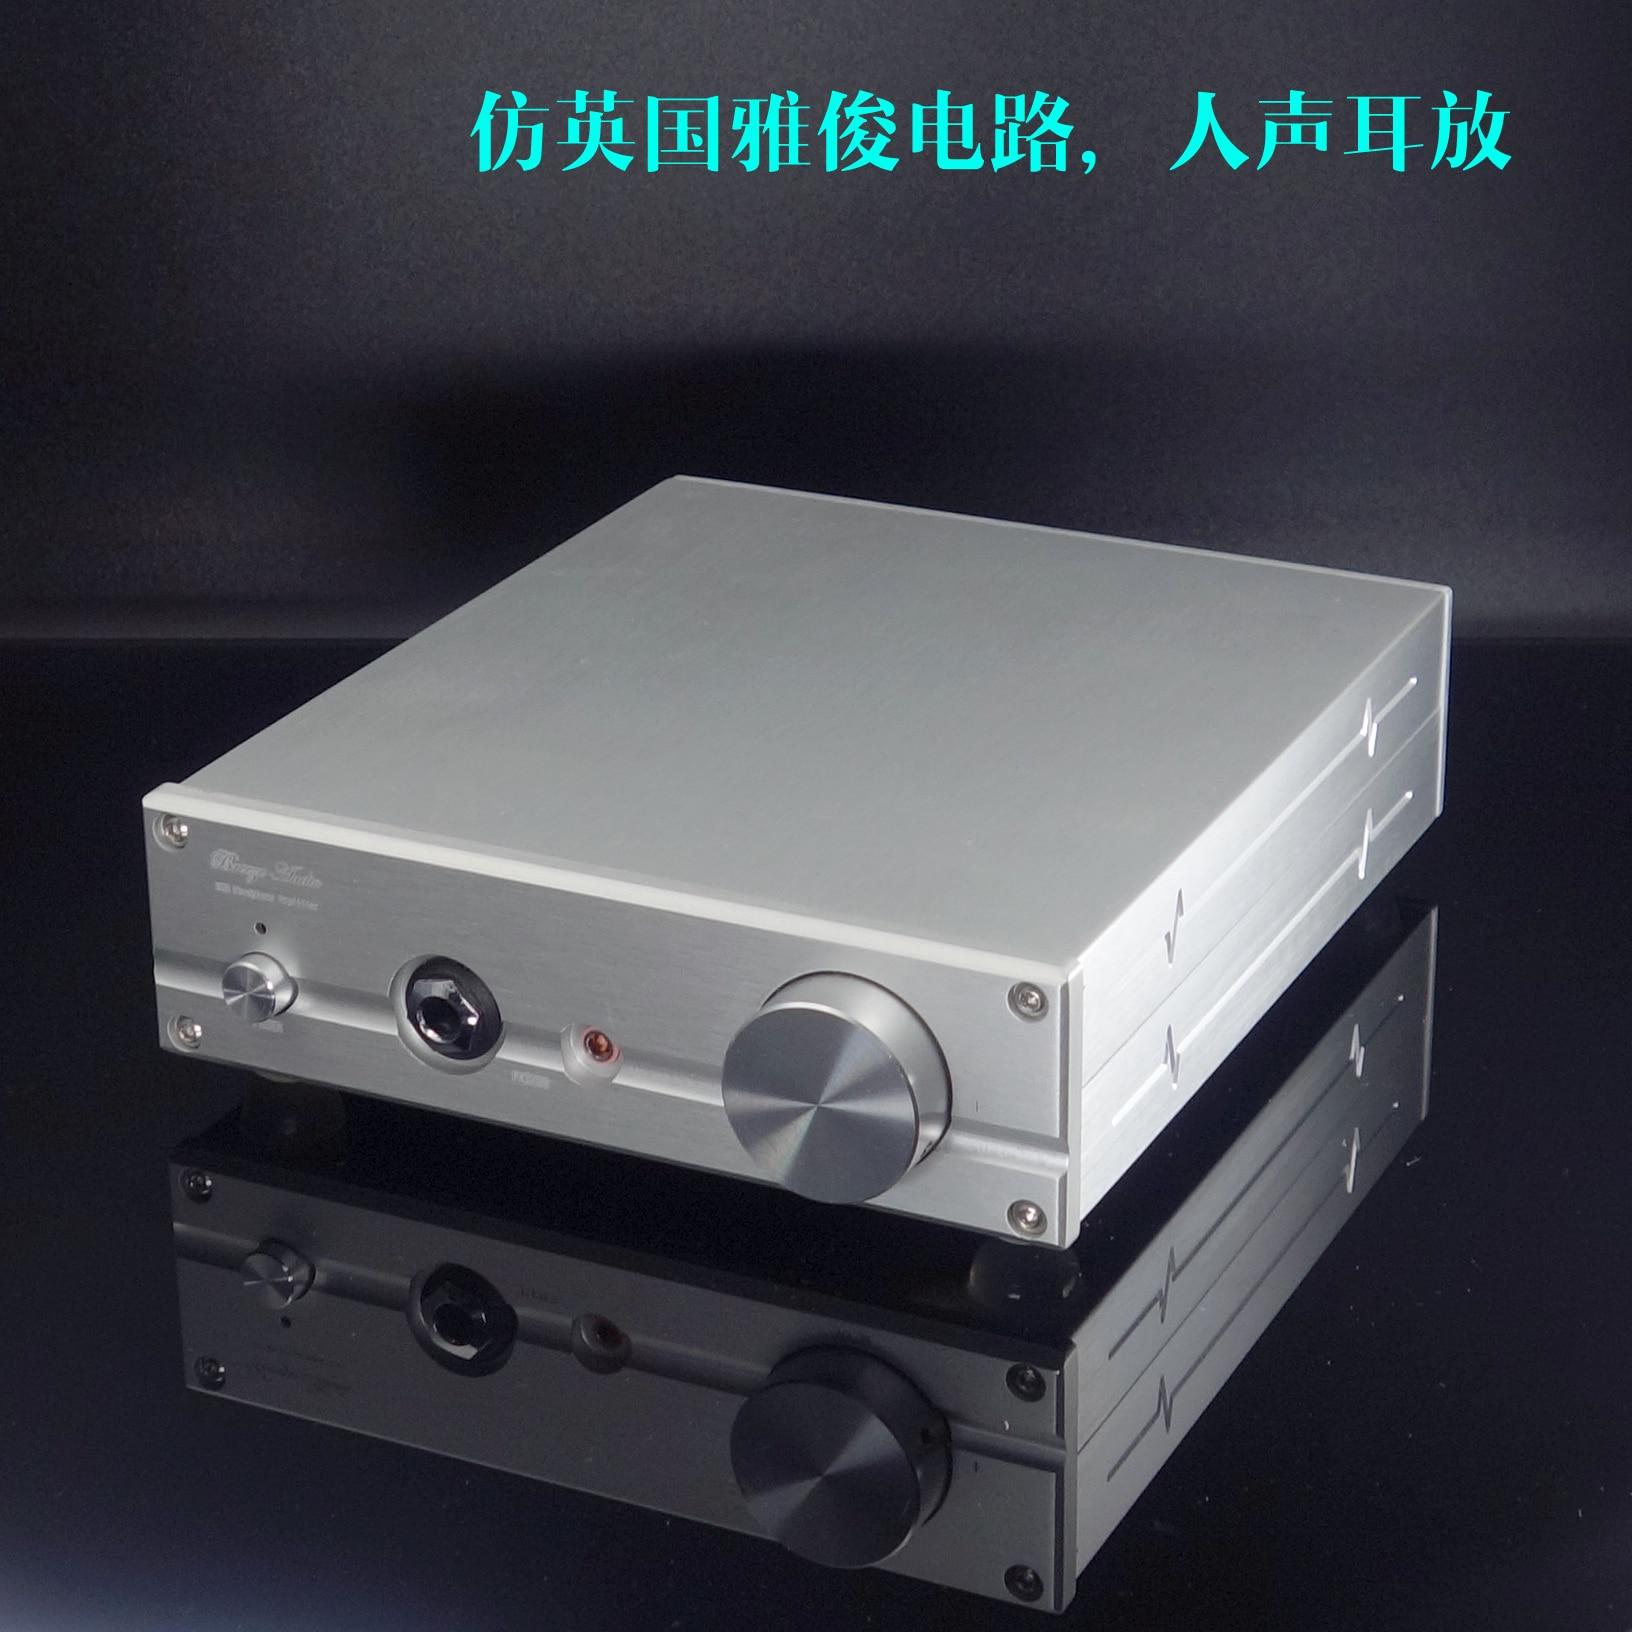 2019 Breeze Audio New E50 Refference to UK Circuit High Performance Headphone Audio Amplifier 800mw/32ohm